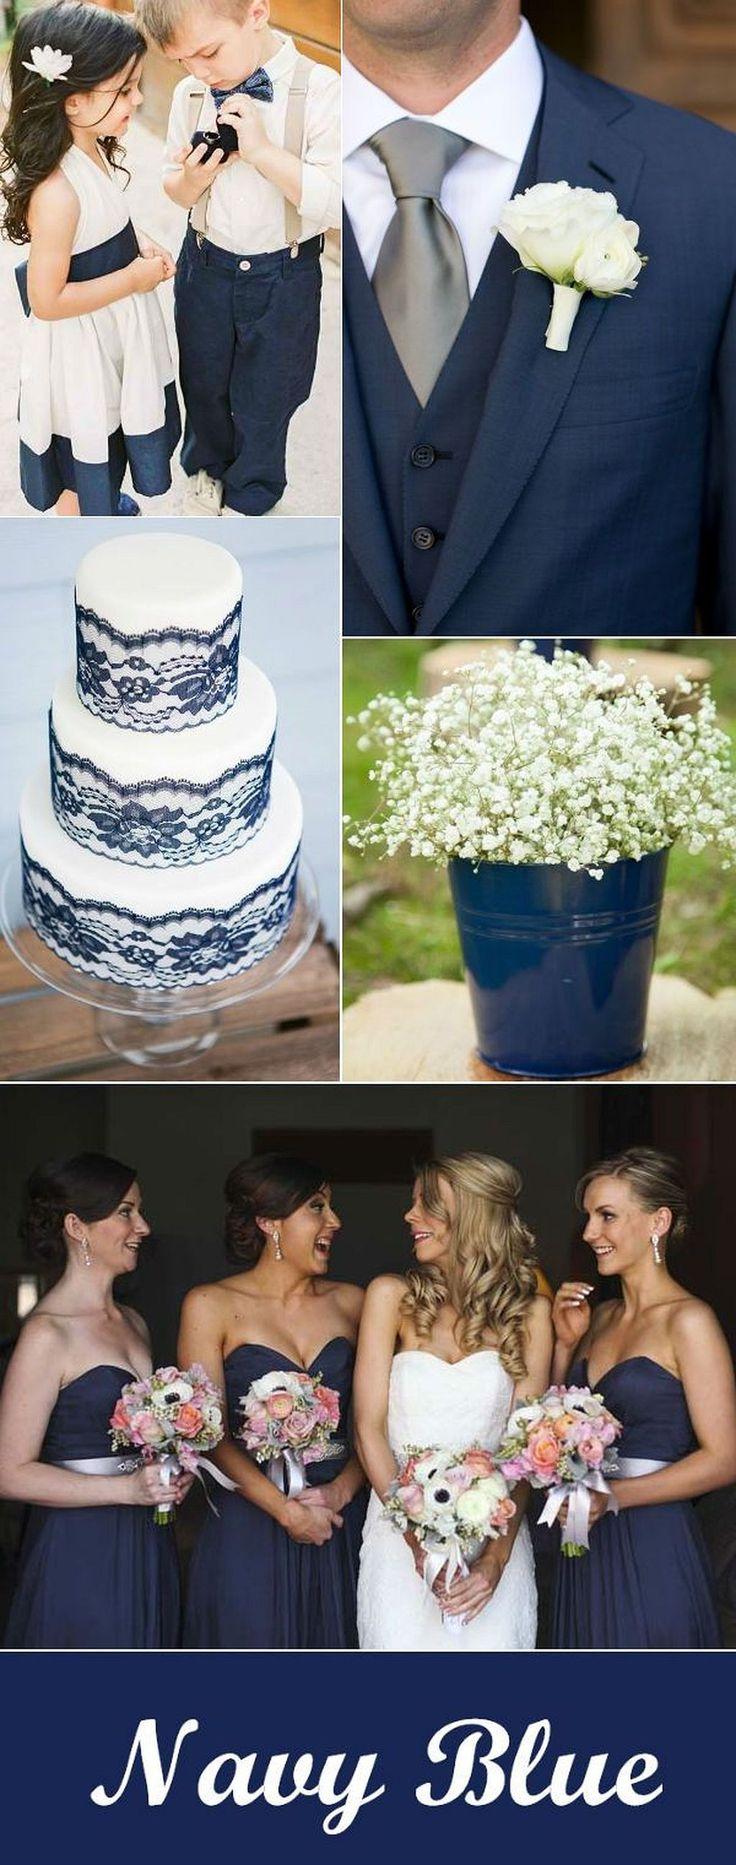 25 best ideas about Navy blue weddings on Pinterest  Navy wedding themes Blue wedding themes